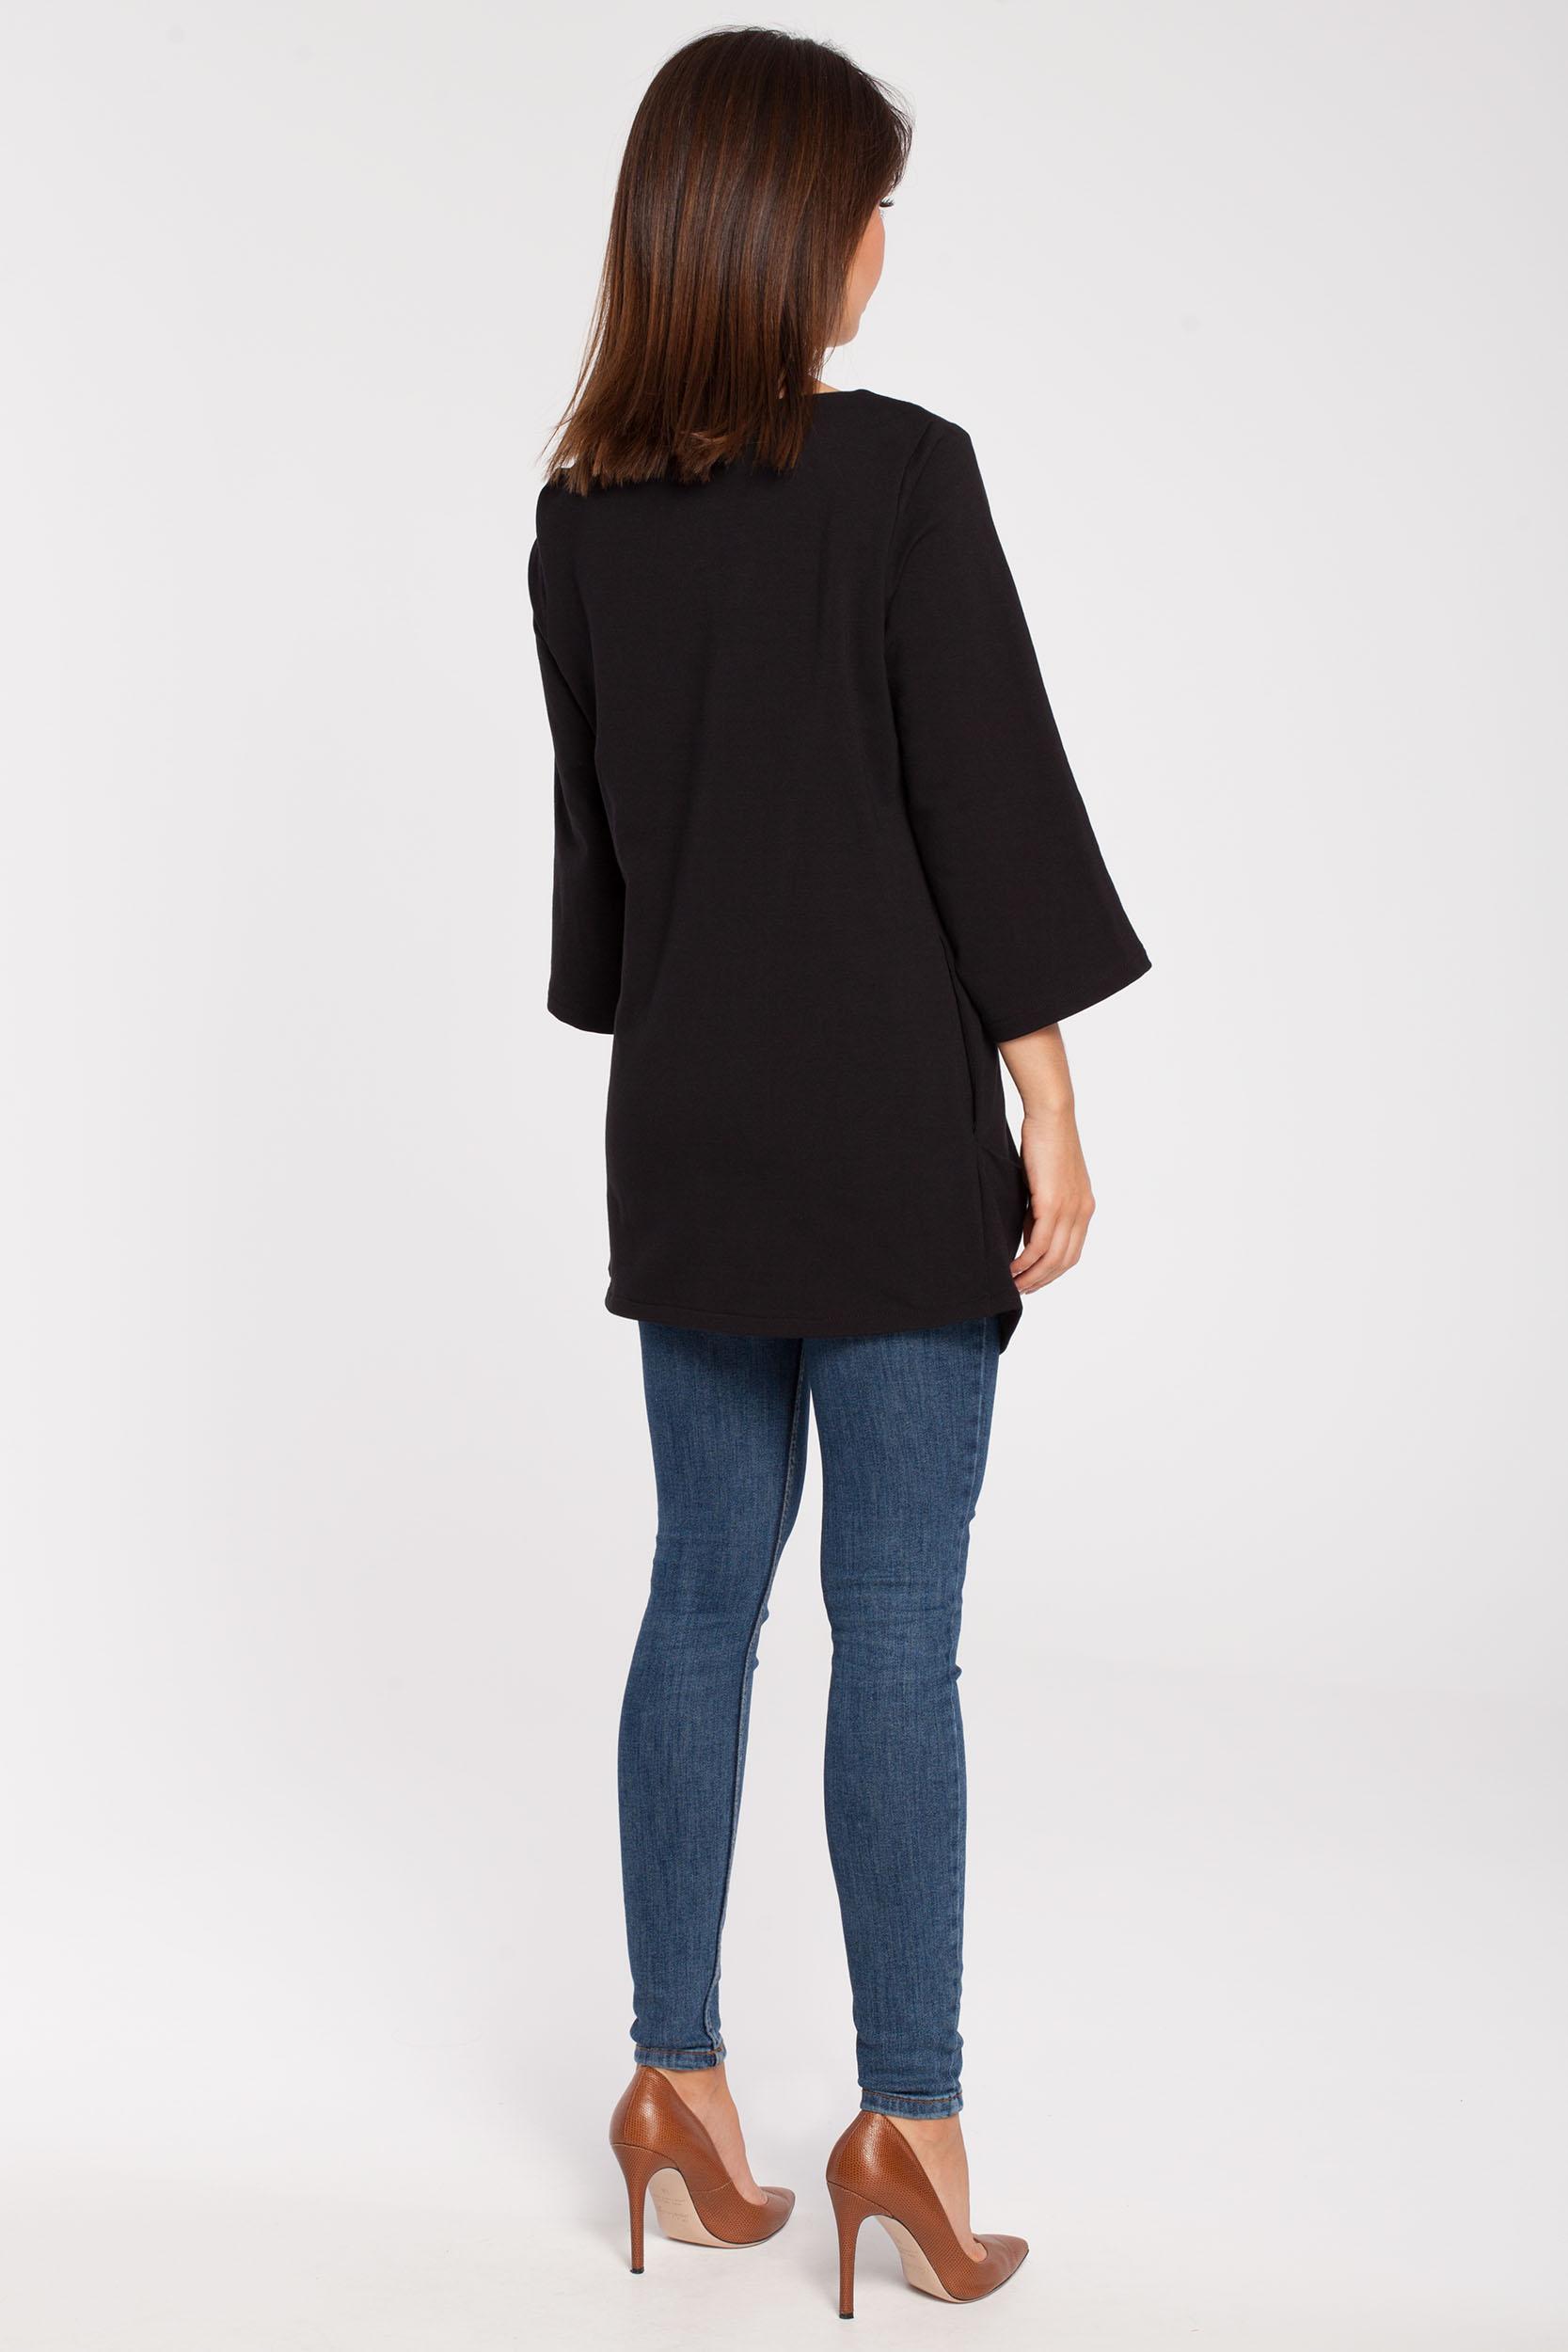 CM2867 Gładka elegancka tunika - czarna